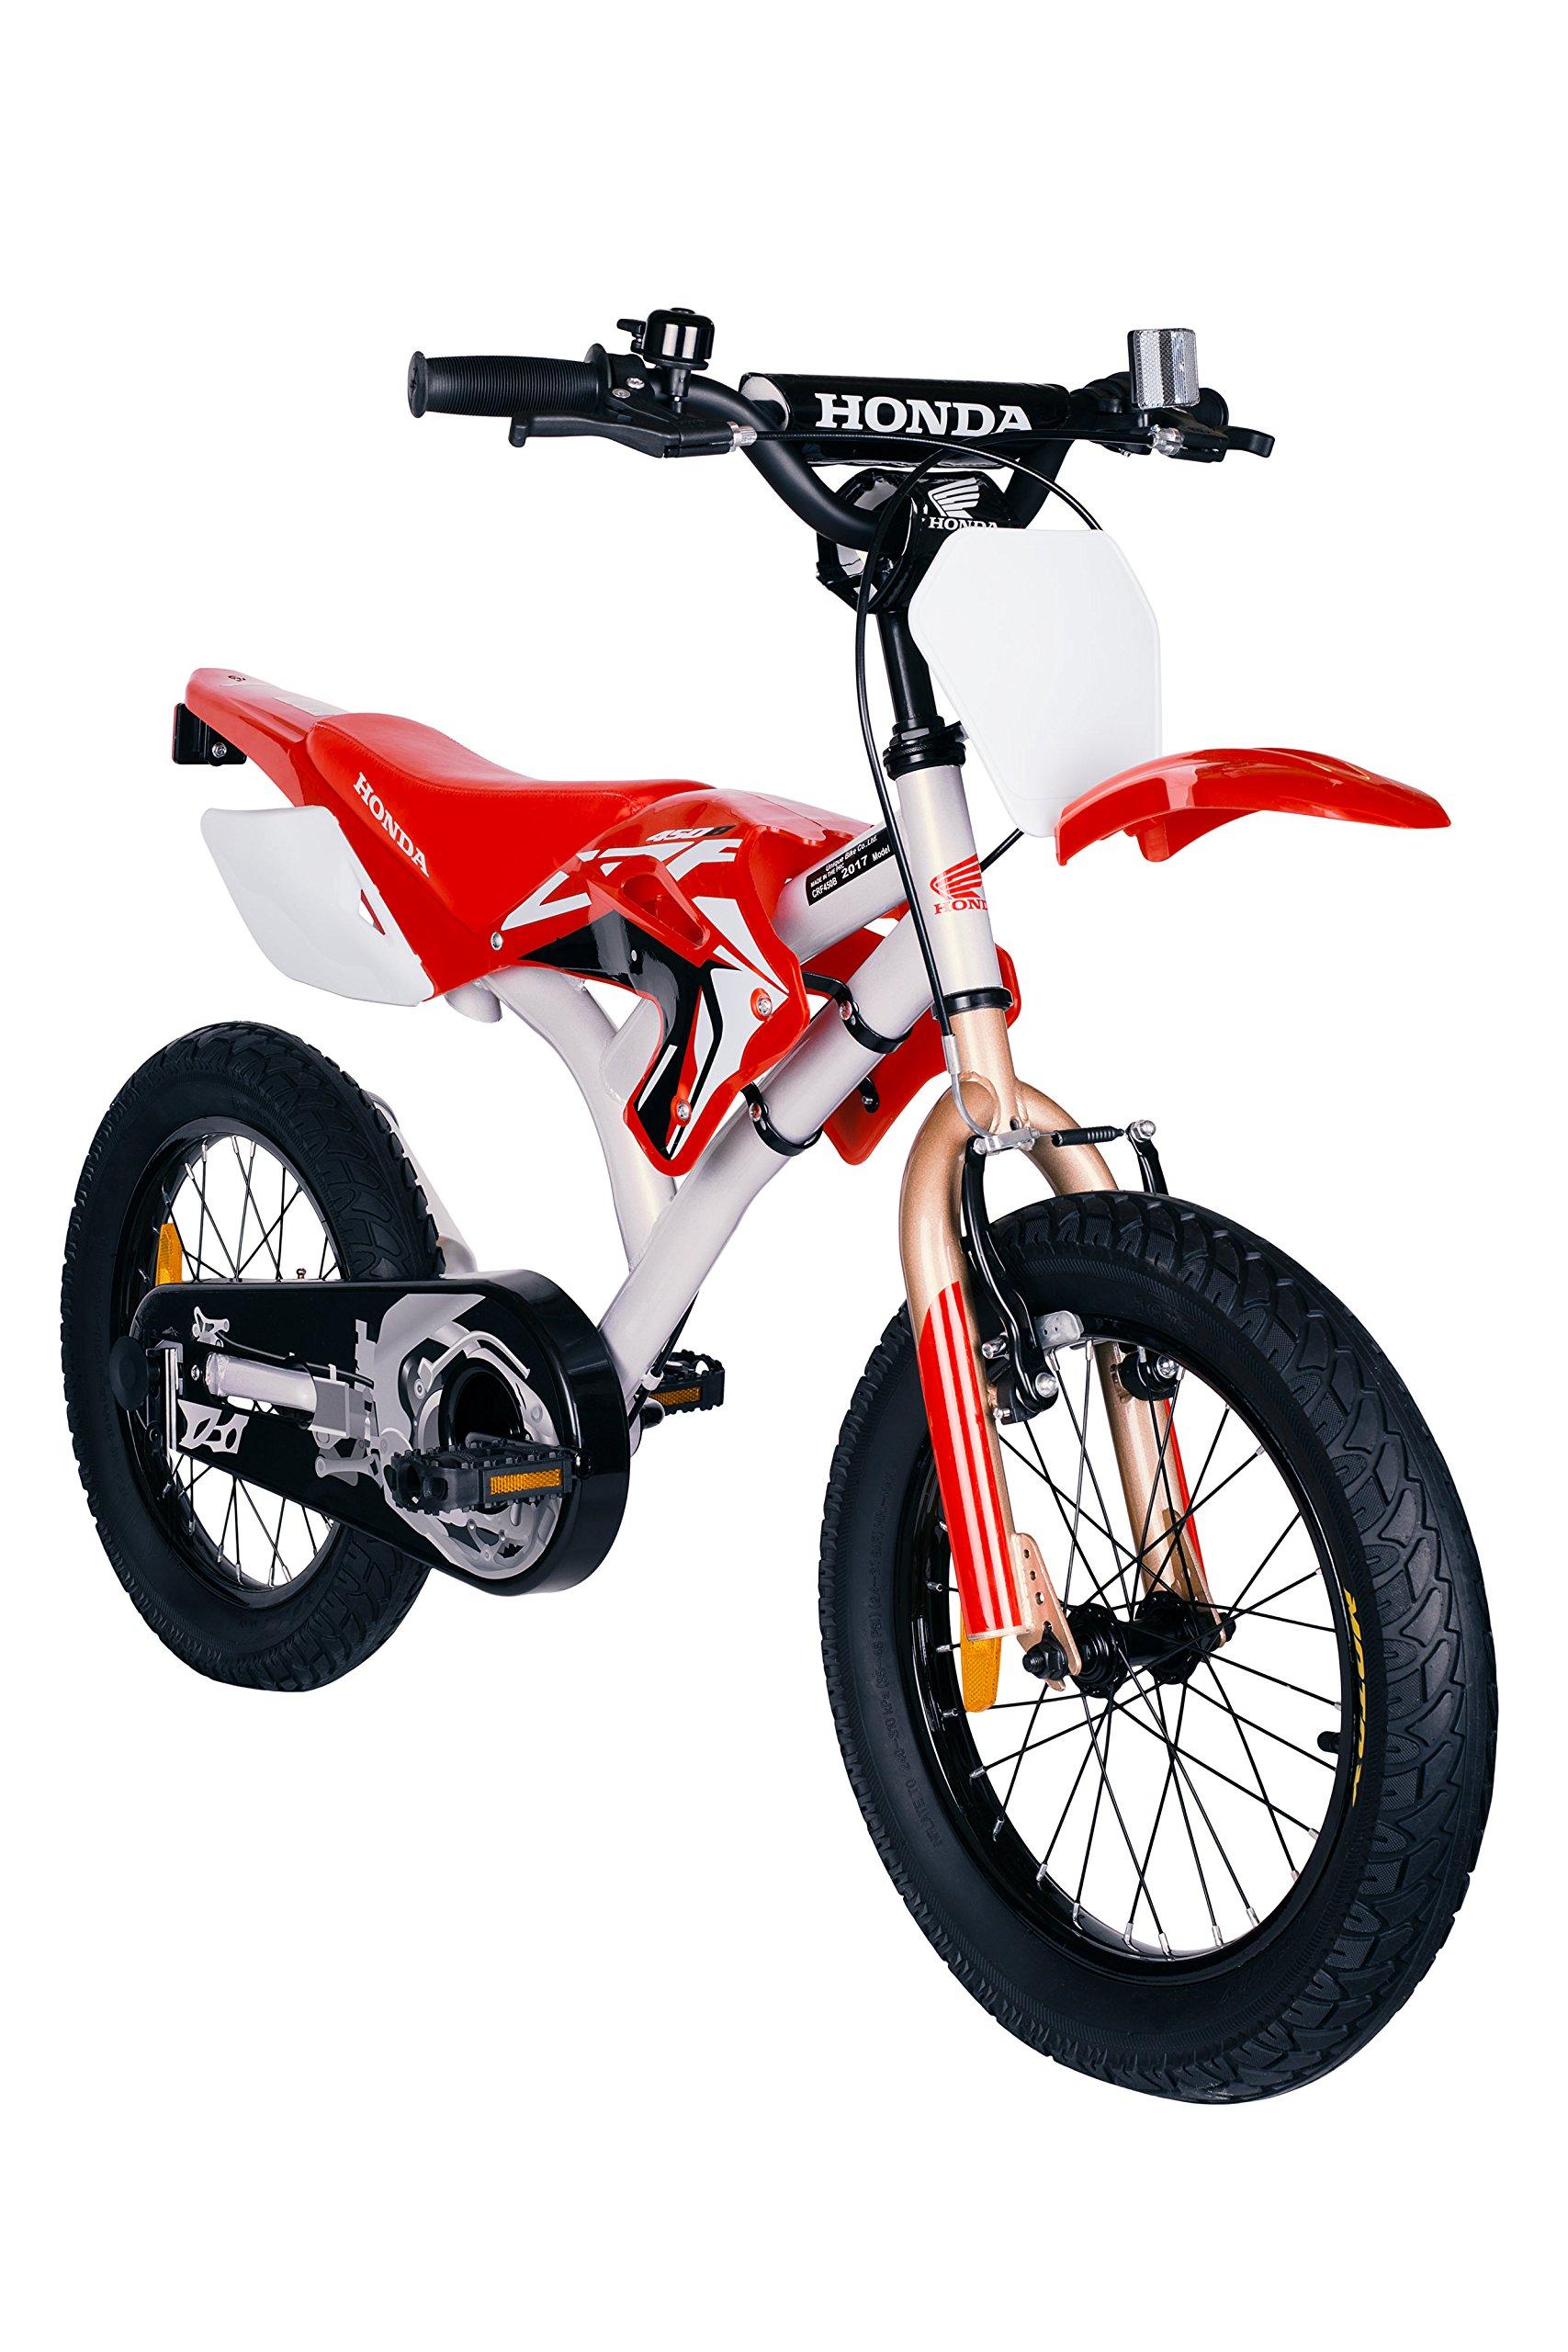 Honda bicycle with turbospoke Exhaust -16 inch Kids bike with stabilisers